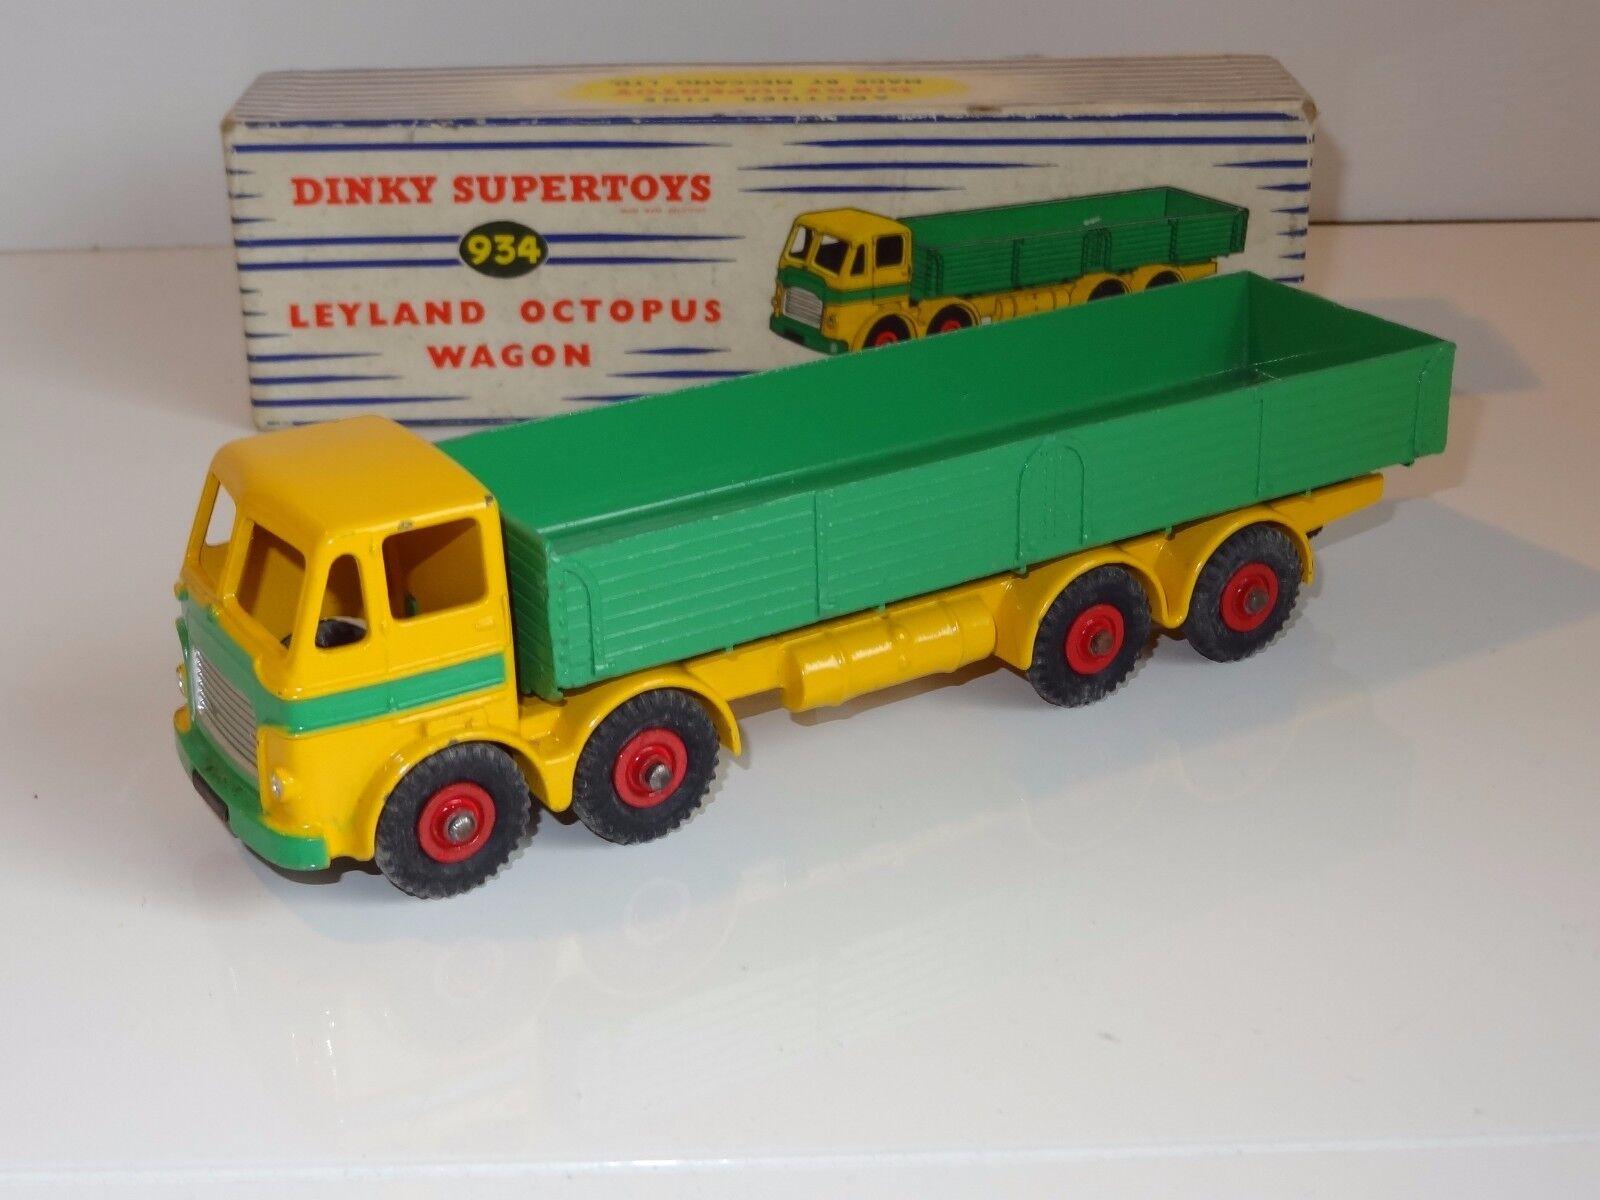 (W) Dinky Leyland Pulpo Vagón - 934